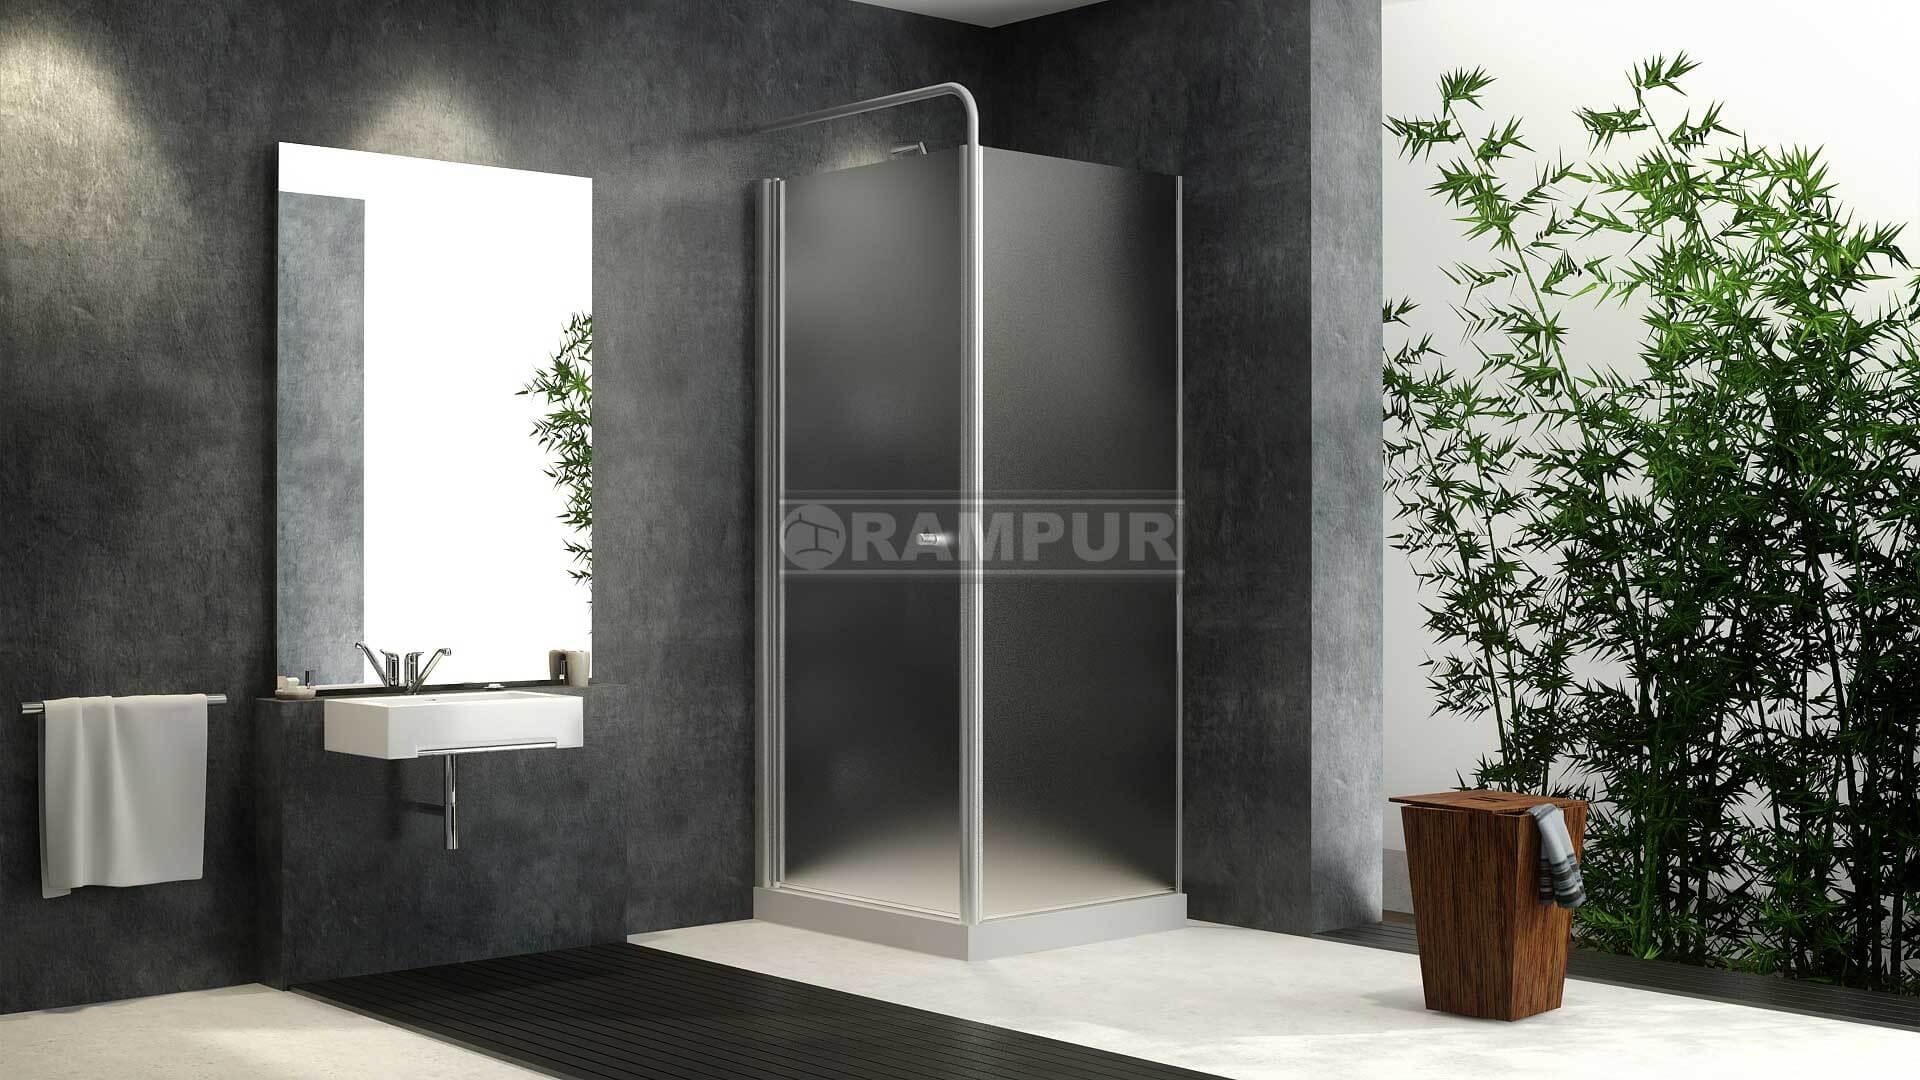 Rampur cabinas para duchas de vidrio parana premium - Cabinas de ducha ...